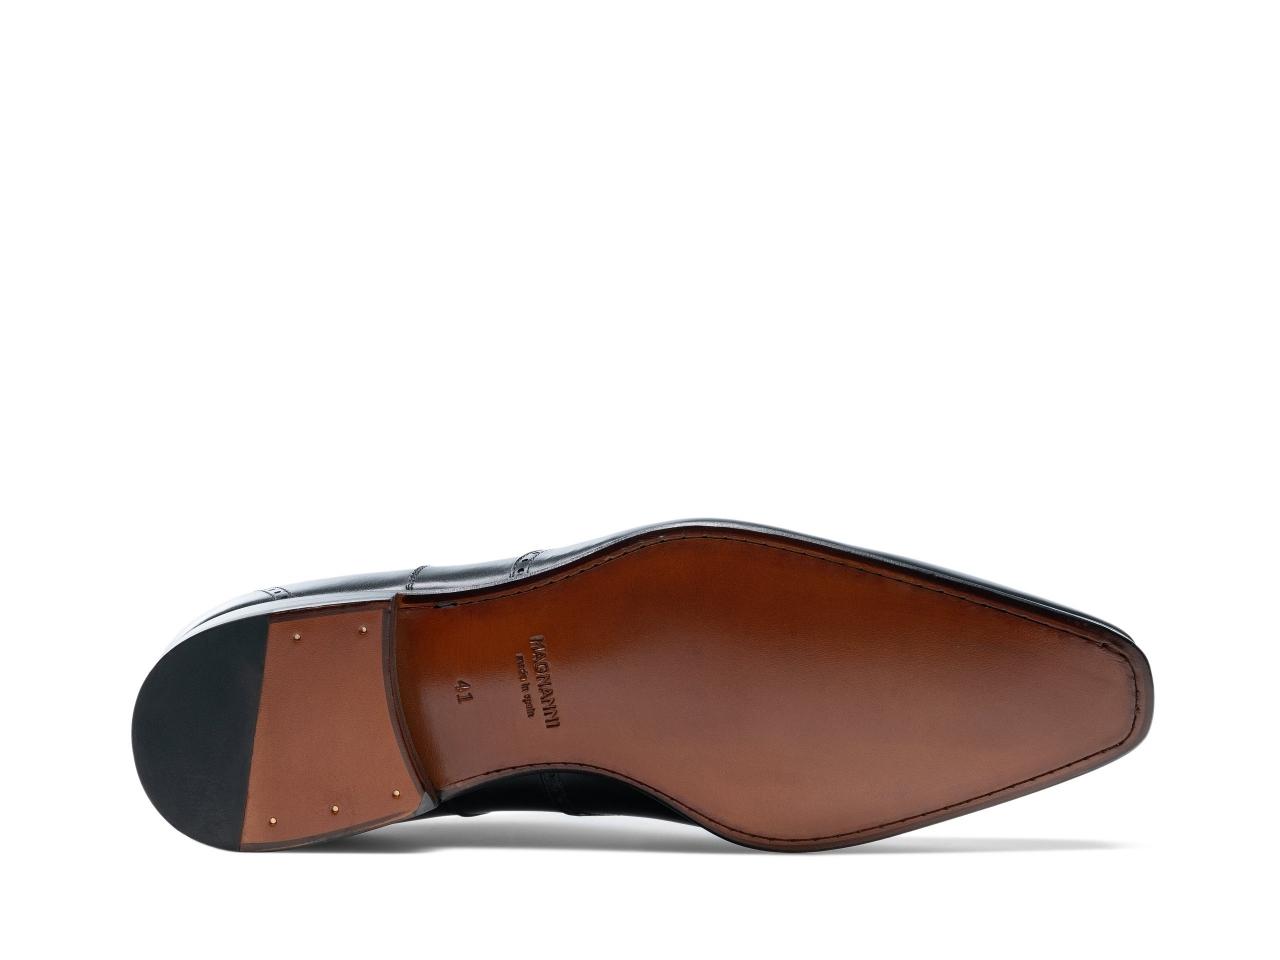 The sole of the Coria